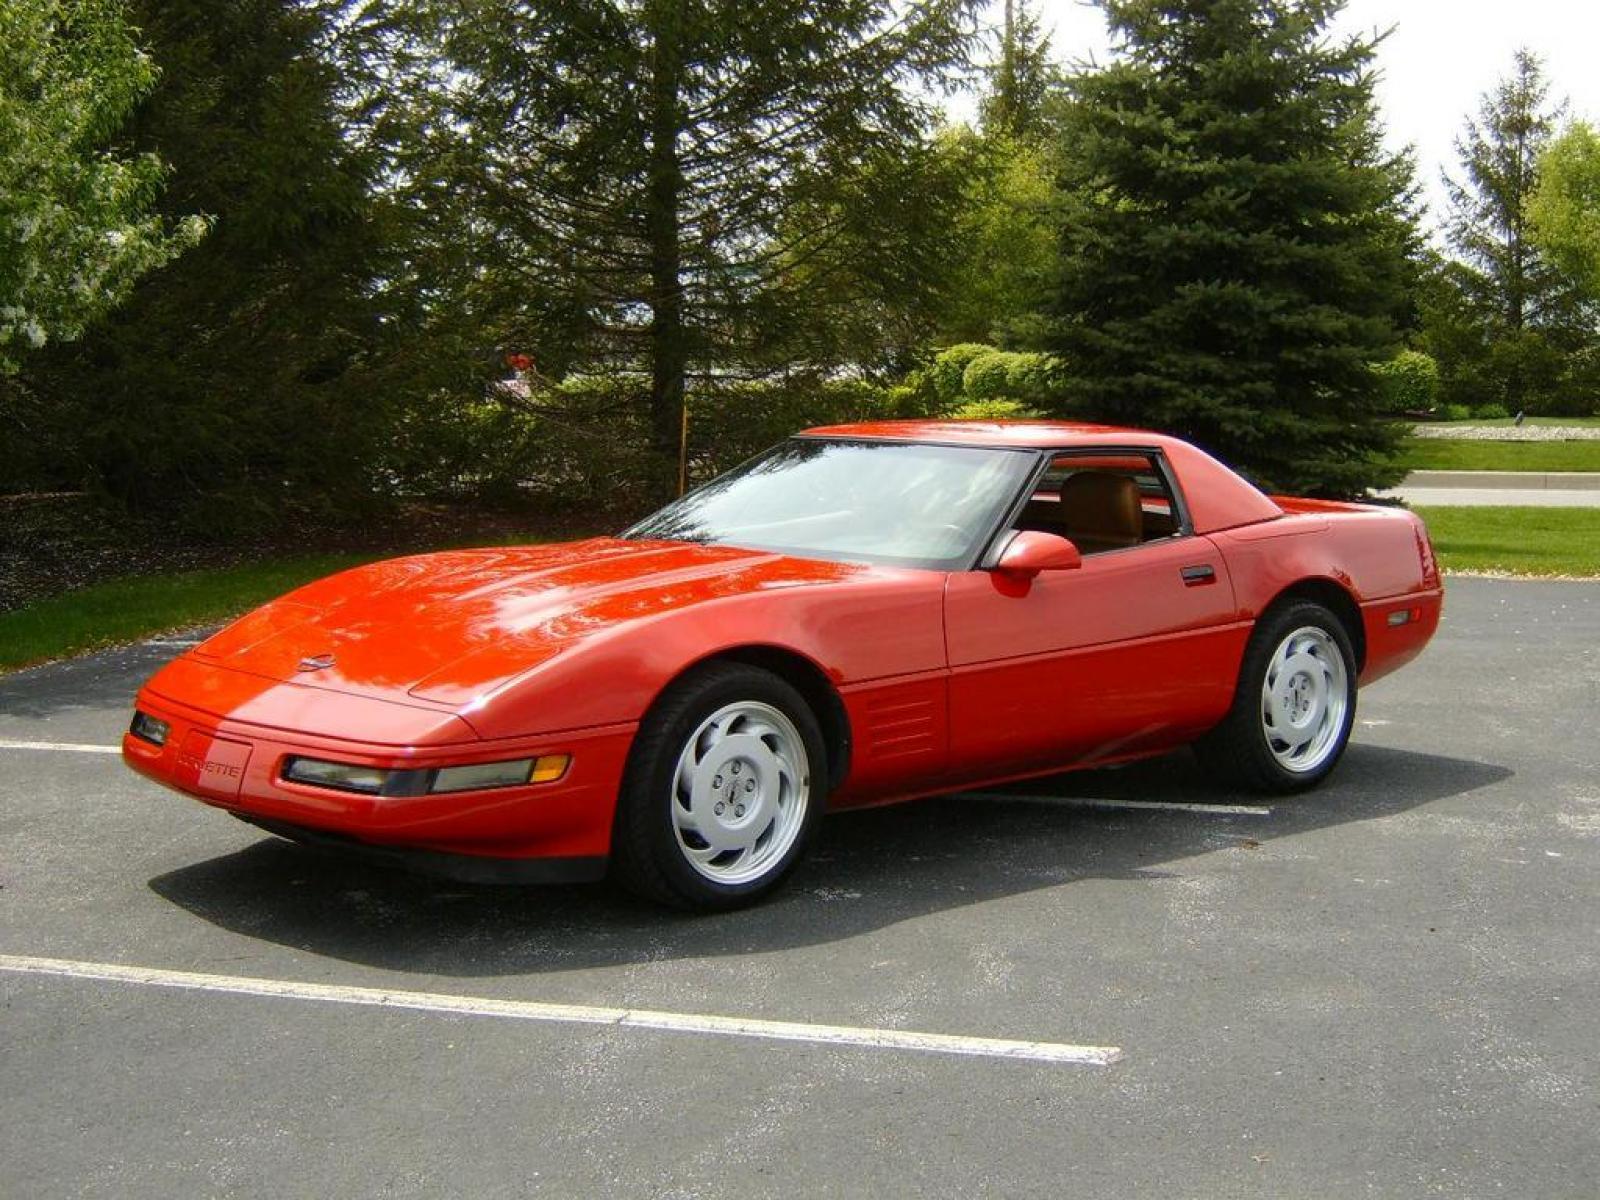 1991 Chevrolet Corvette - Information and photos - Zomb Drive